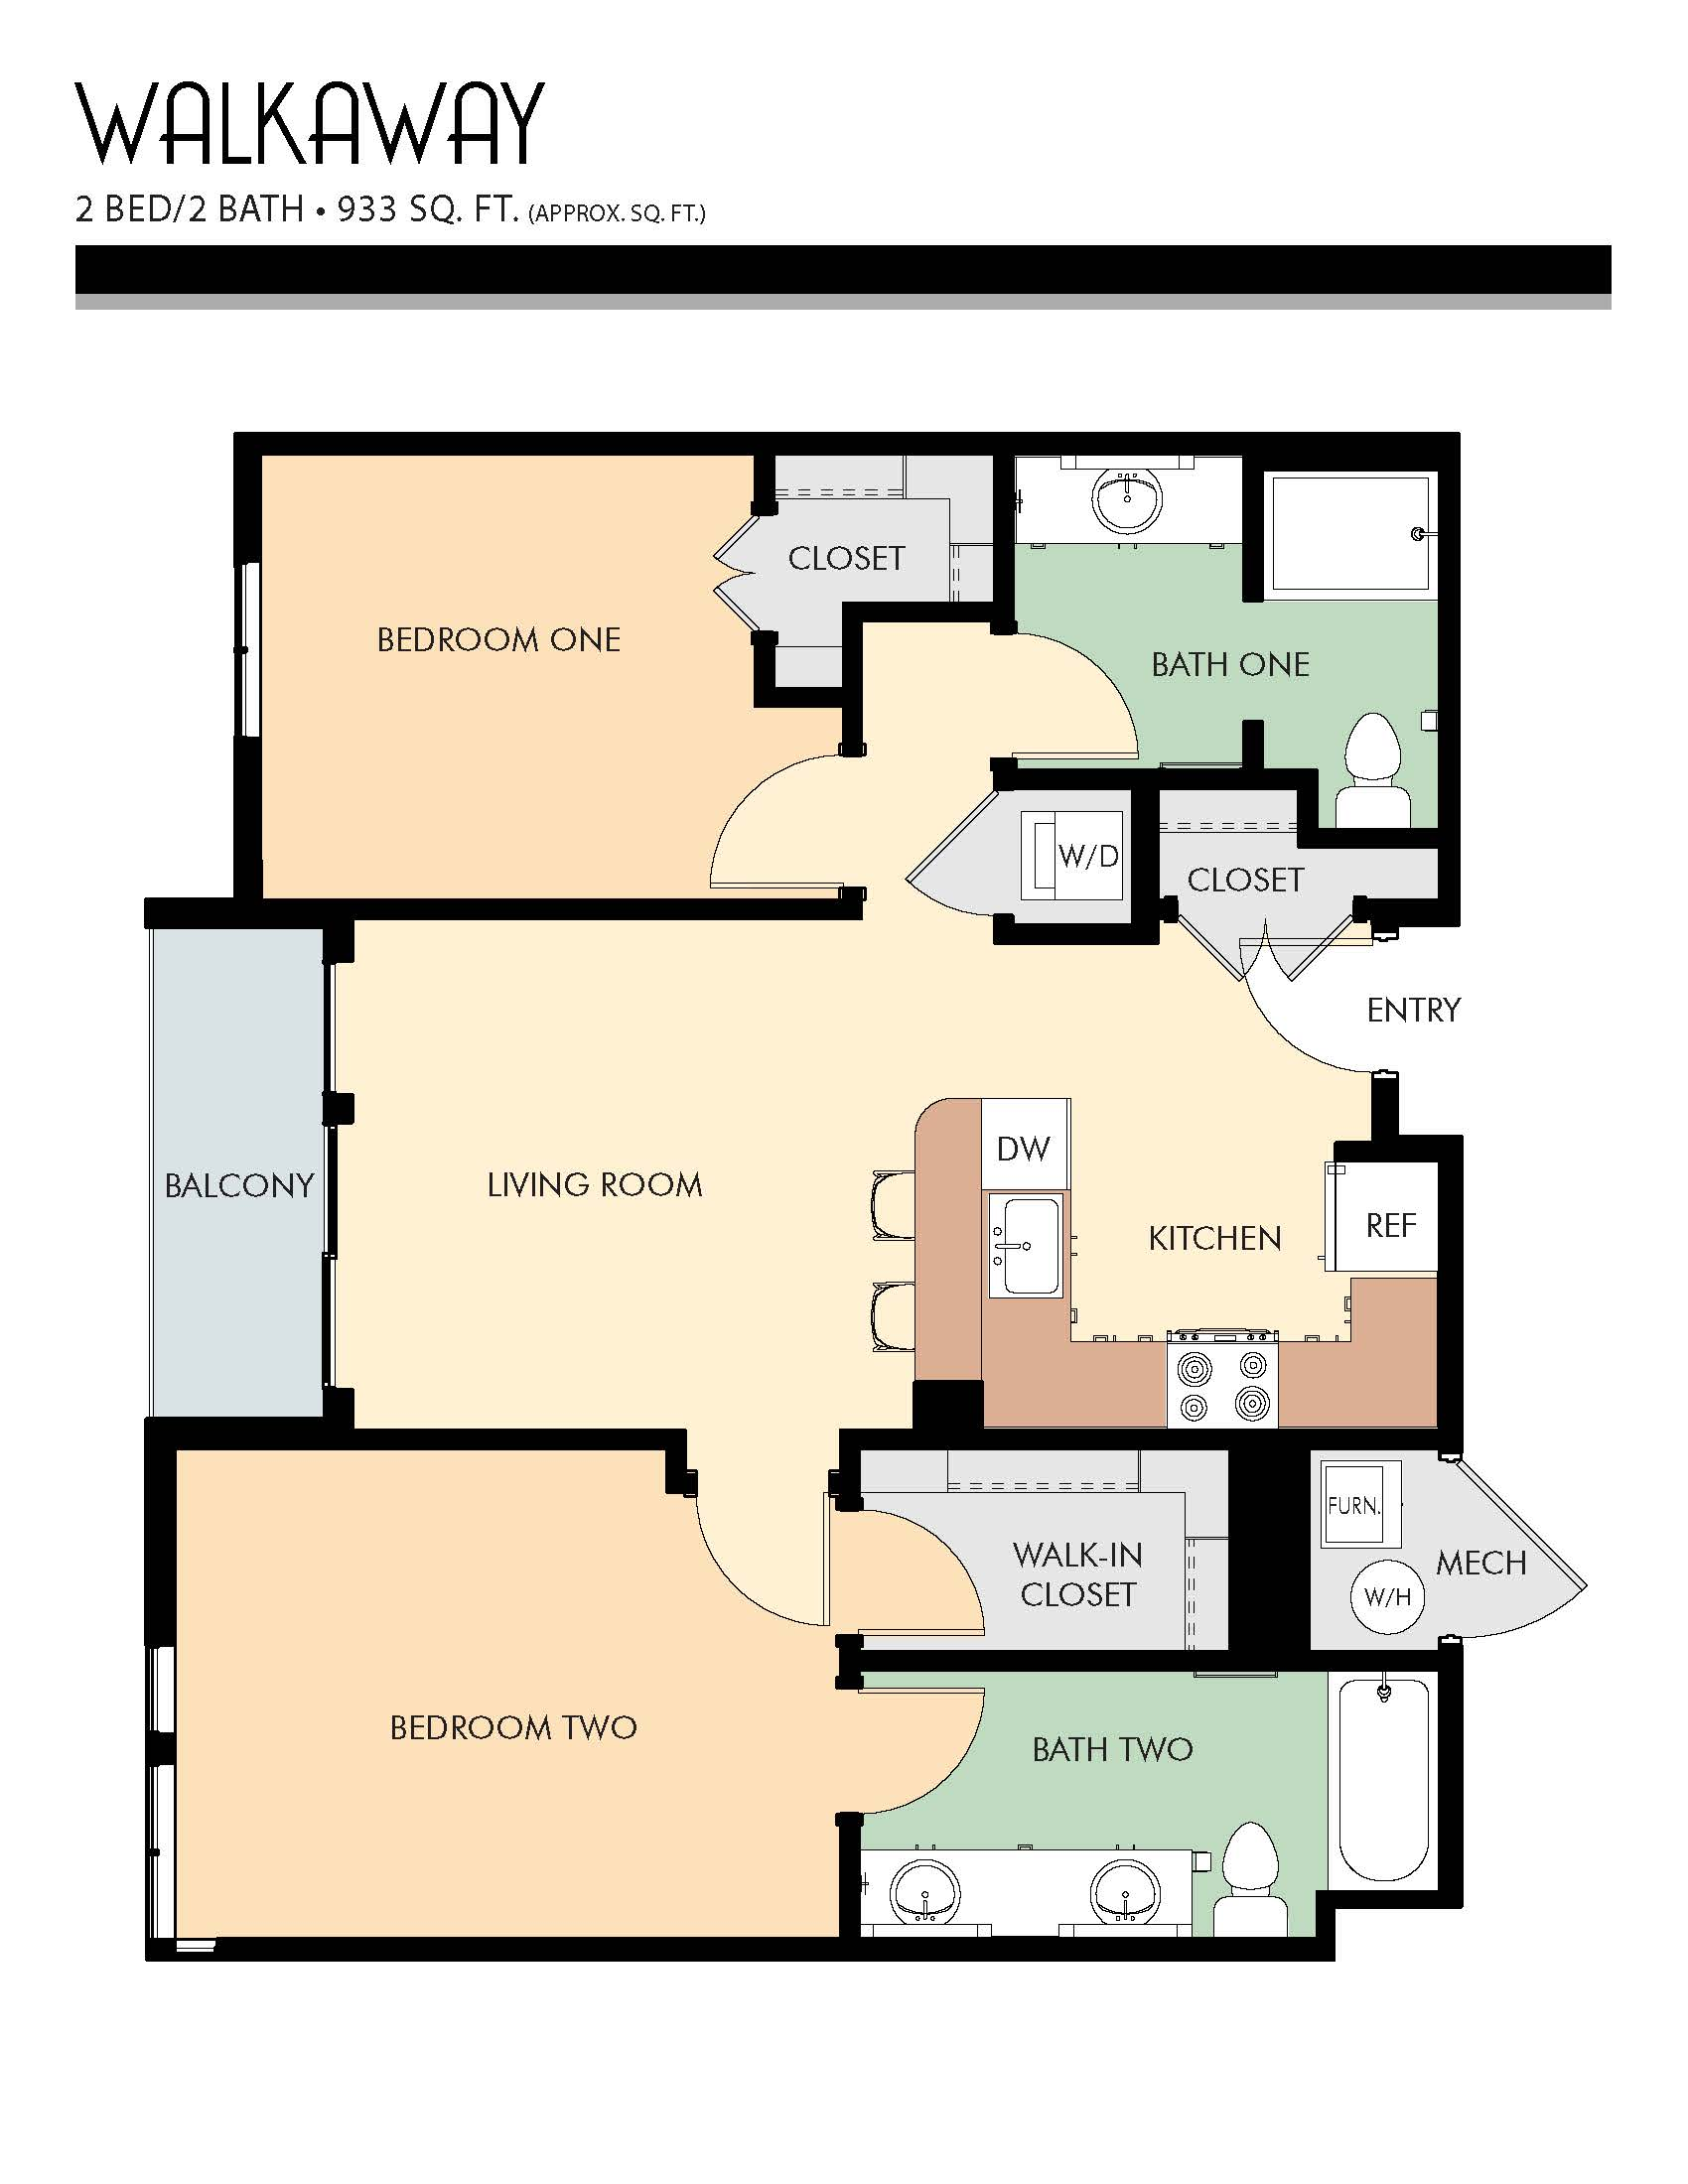 Walkaway floor plans - 2 Bed / 2 Bath (933 Sq Ft)